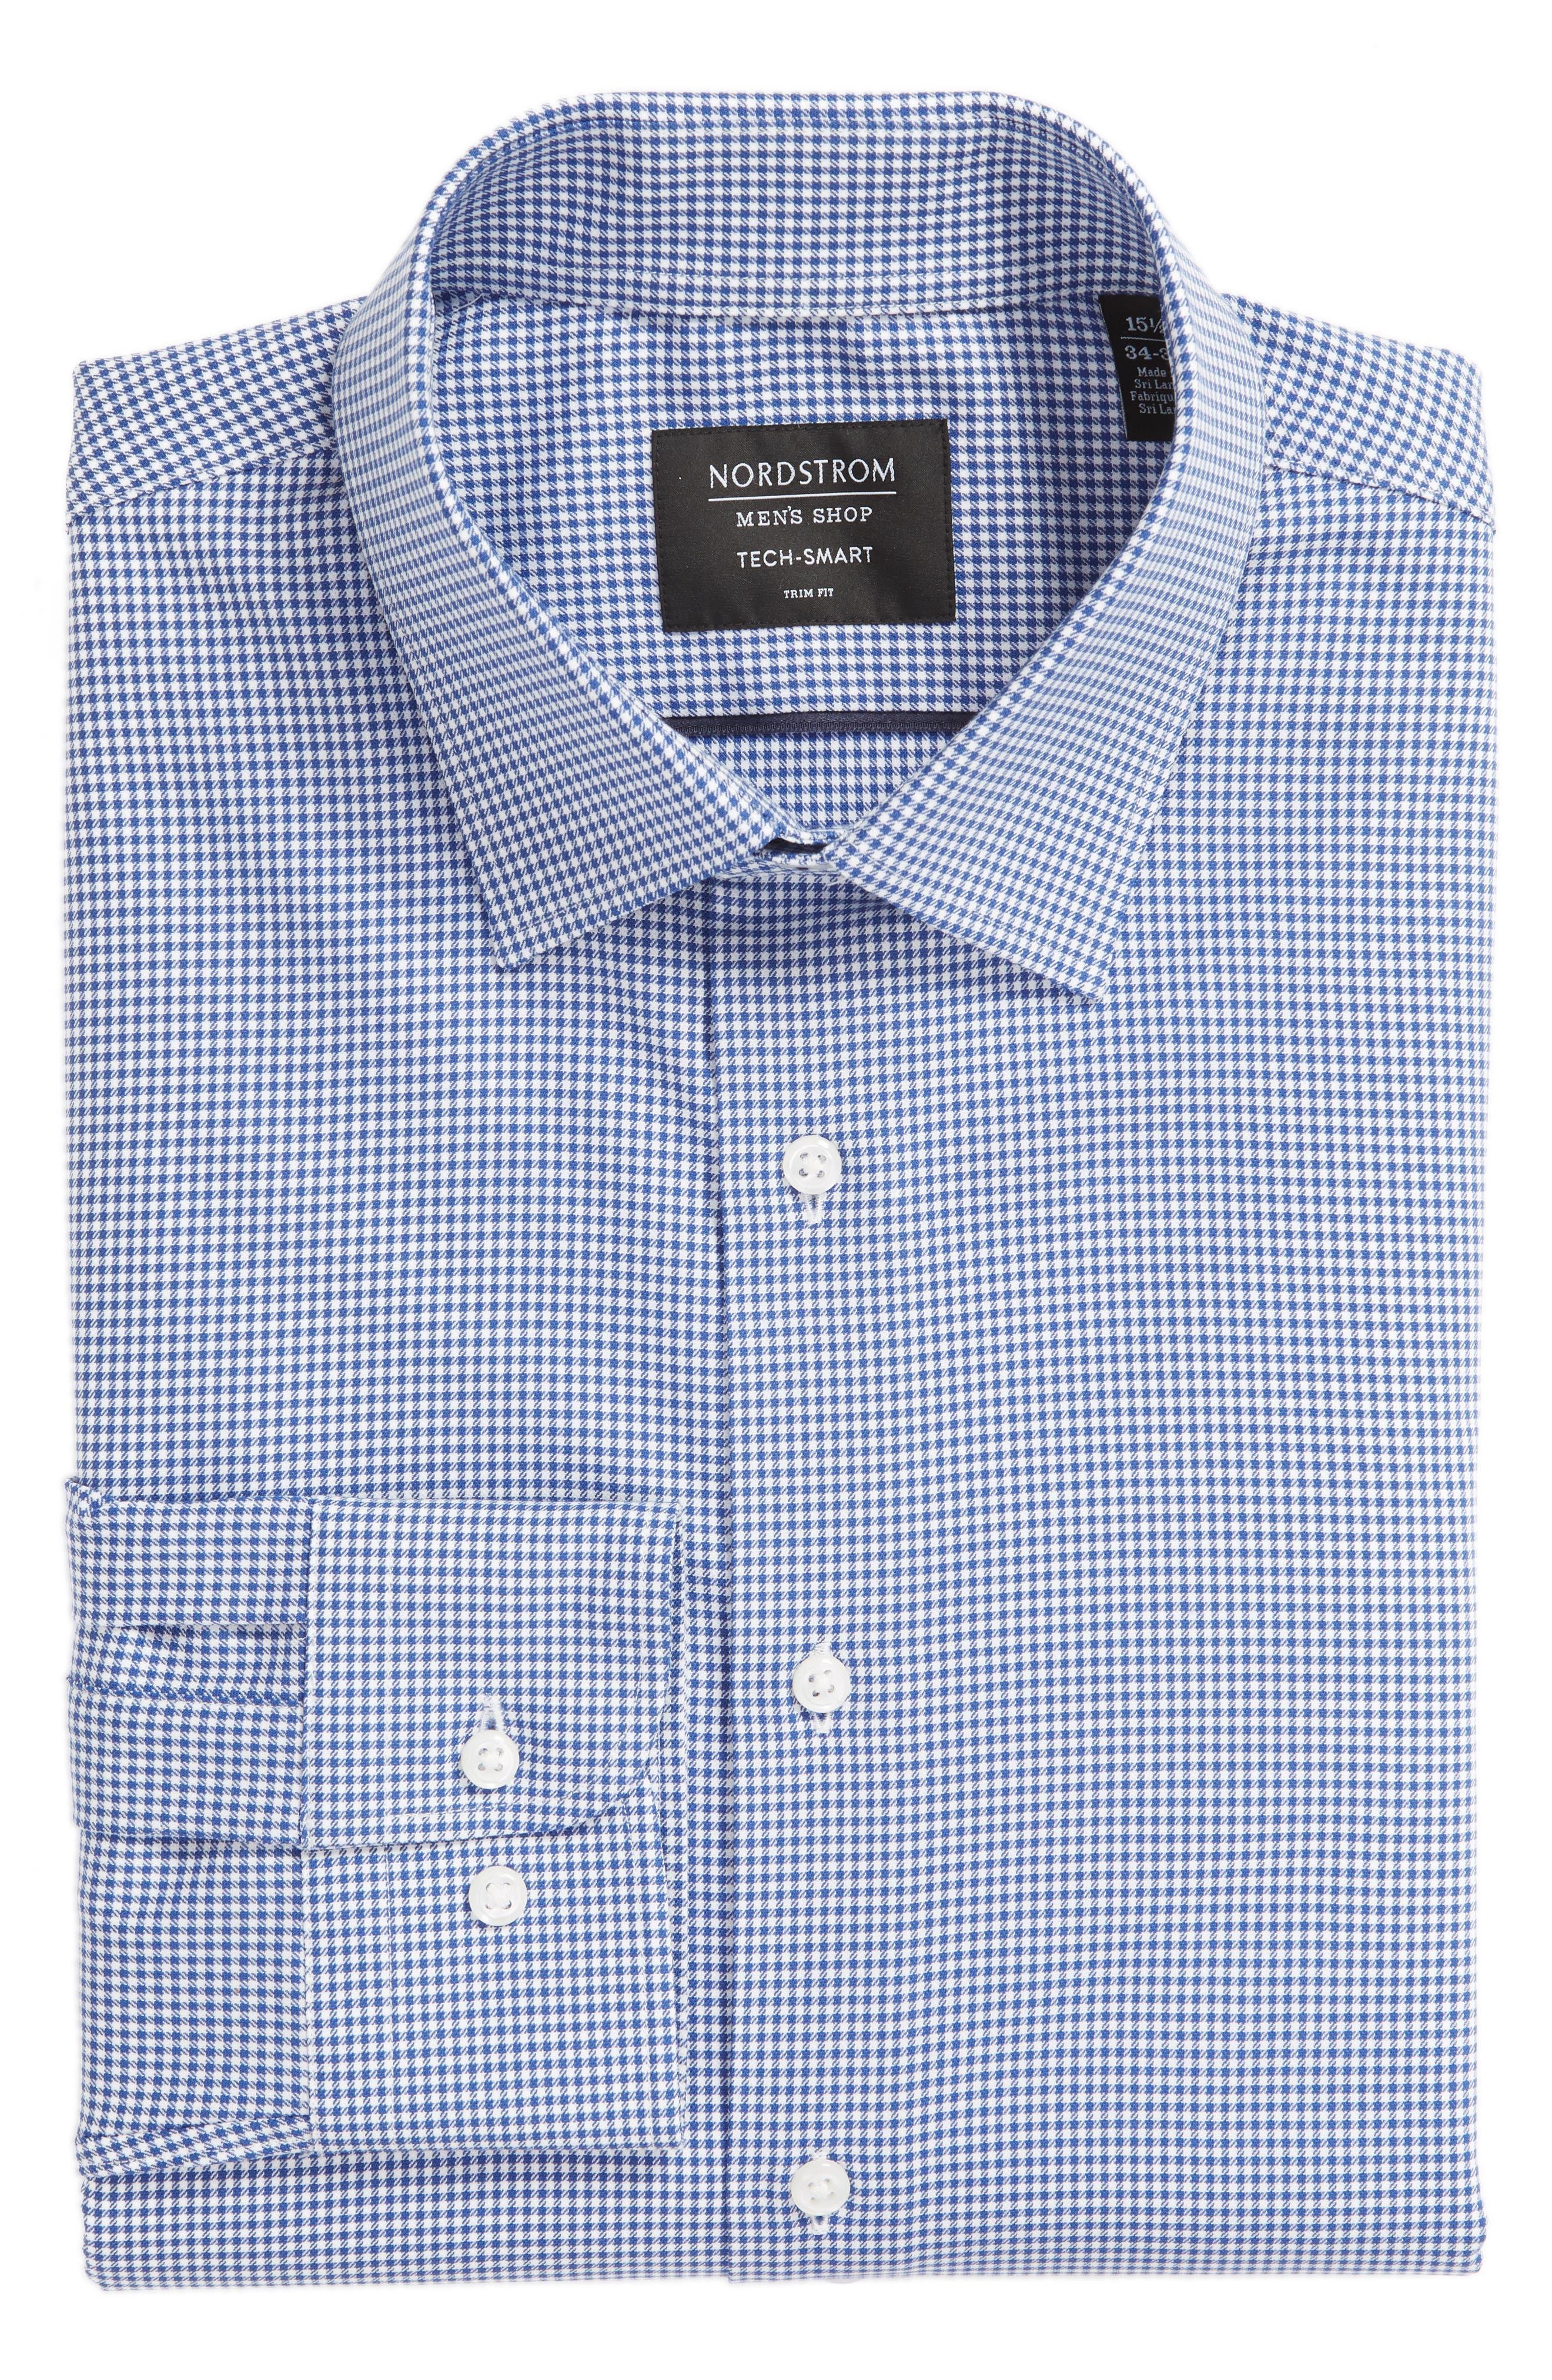 Tech-Smart Trim Fit Stretch Check Dress Shirt,                             Alternate thumbnail 5, color,                             BLUE MARINE